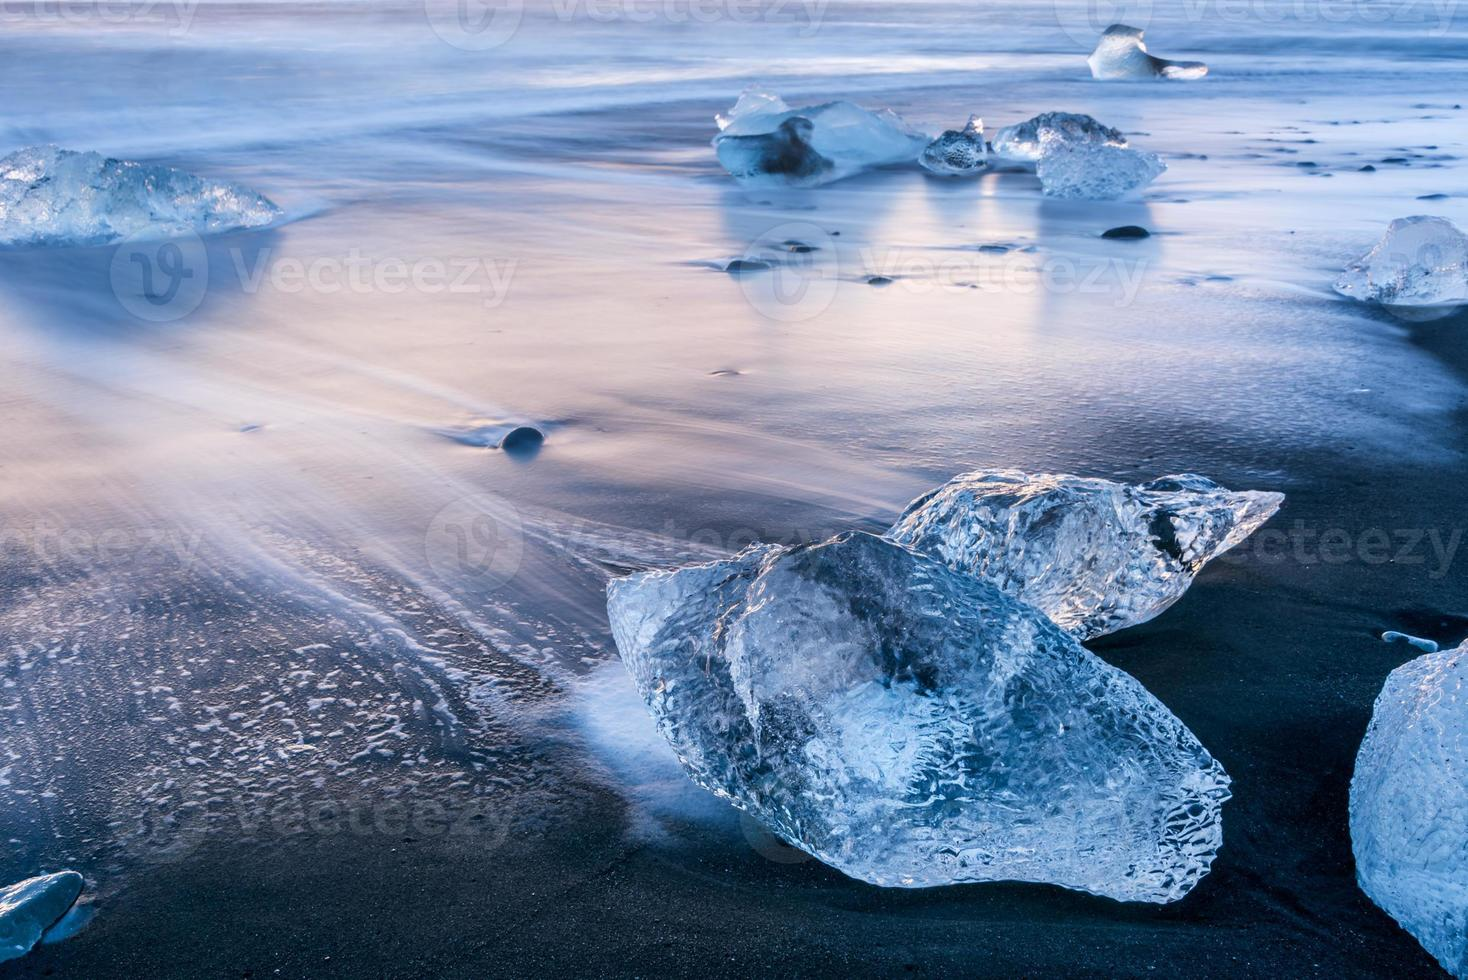 lindo gelo azul na praia de areia preta, jokulsarlon, Islândia foto